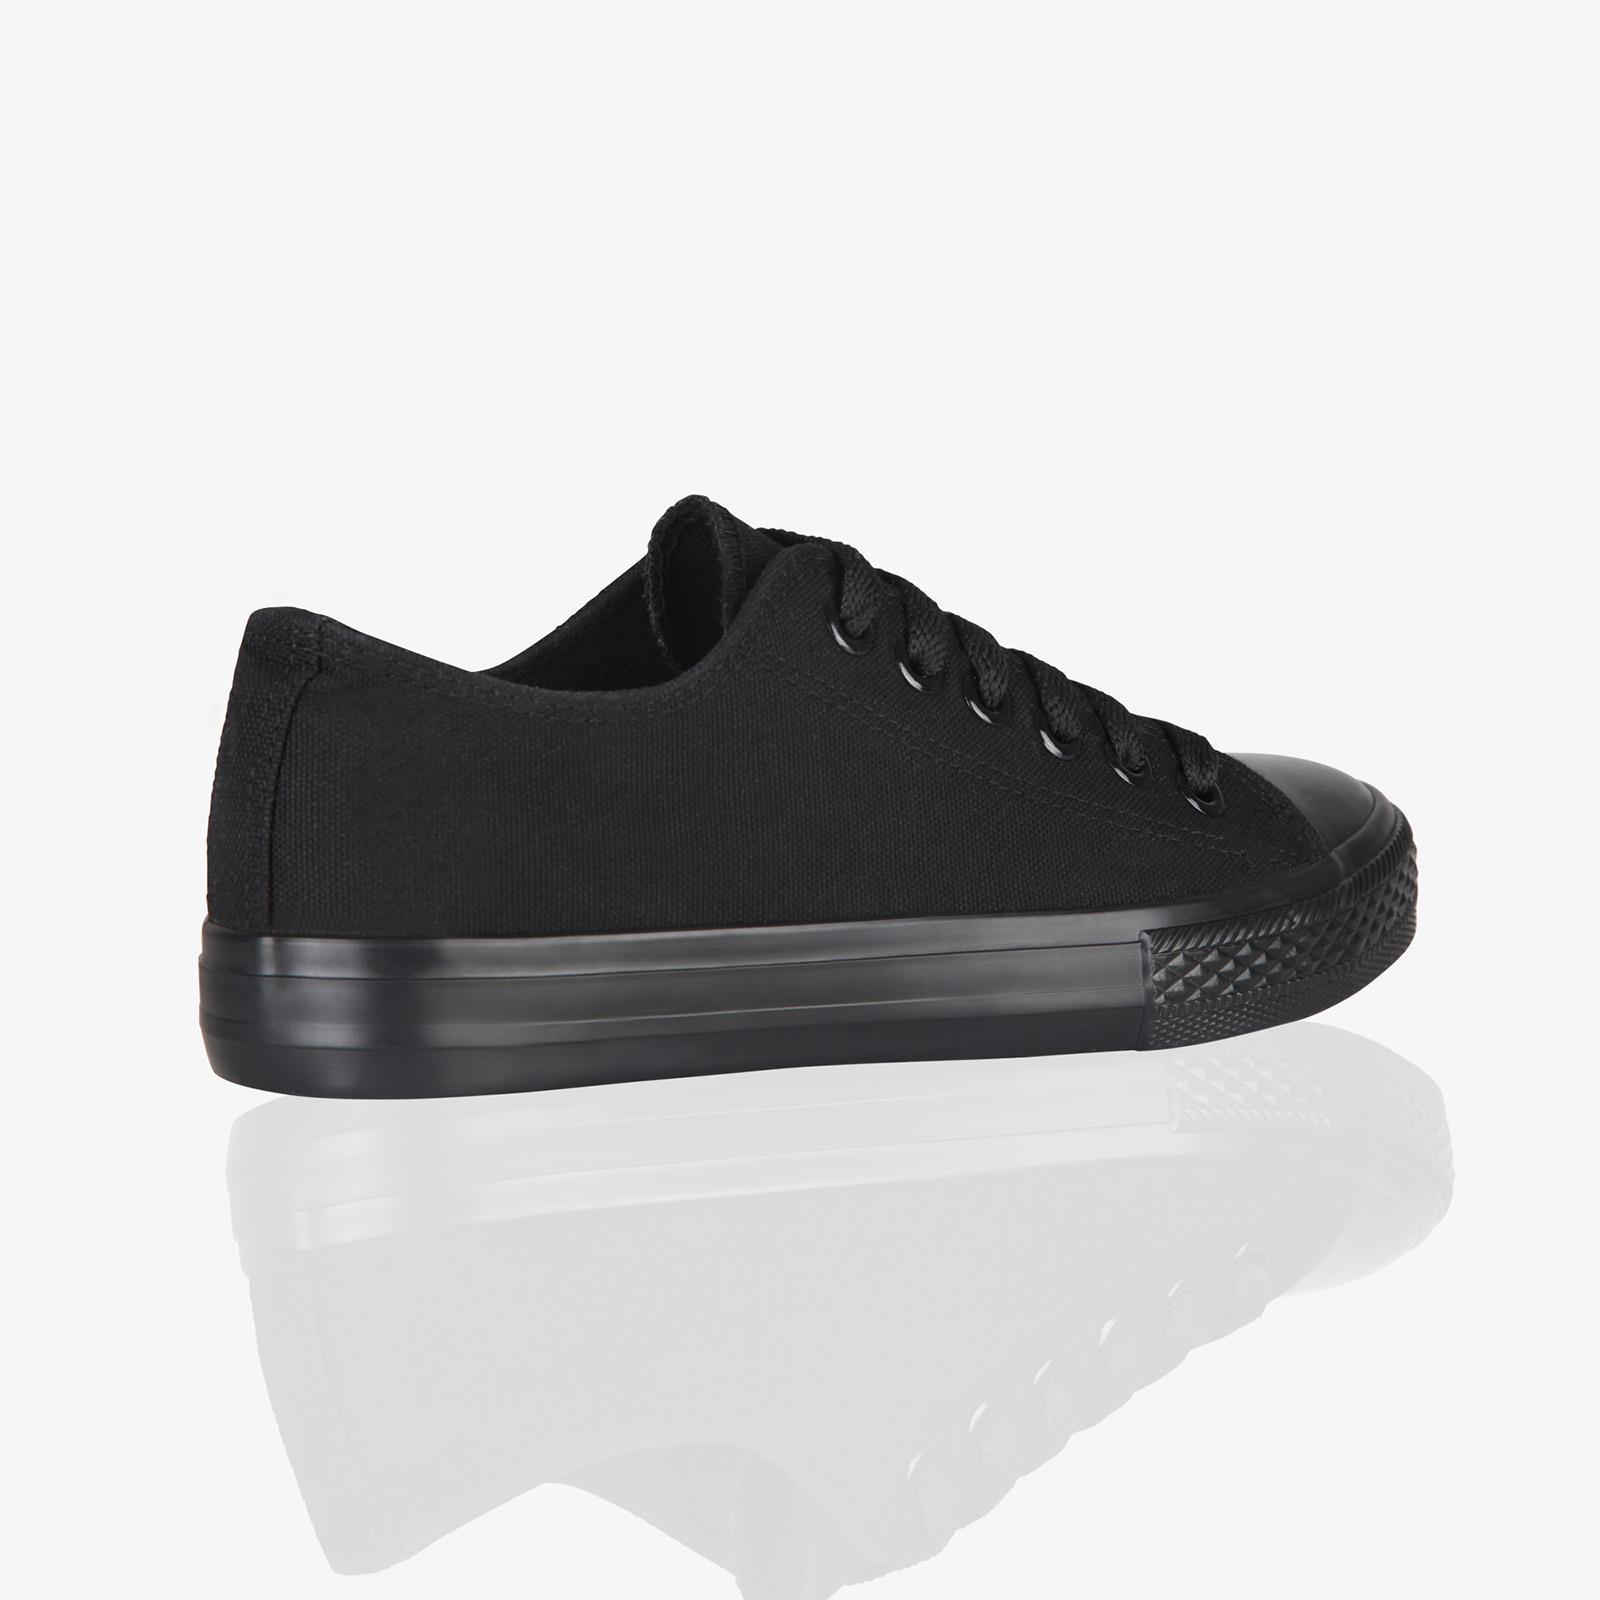 Zapatillas-Mujer-Casuales-Deportiva-Barata-Lona-Moda-Originales-Outlet-Tela-Moda miniatura 31